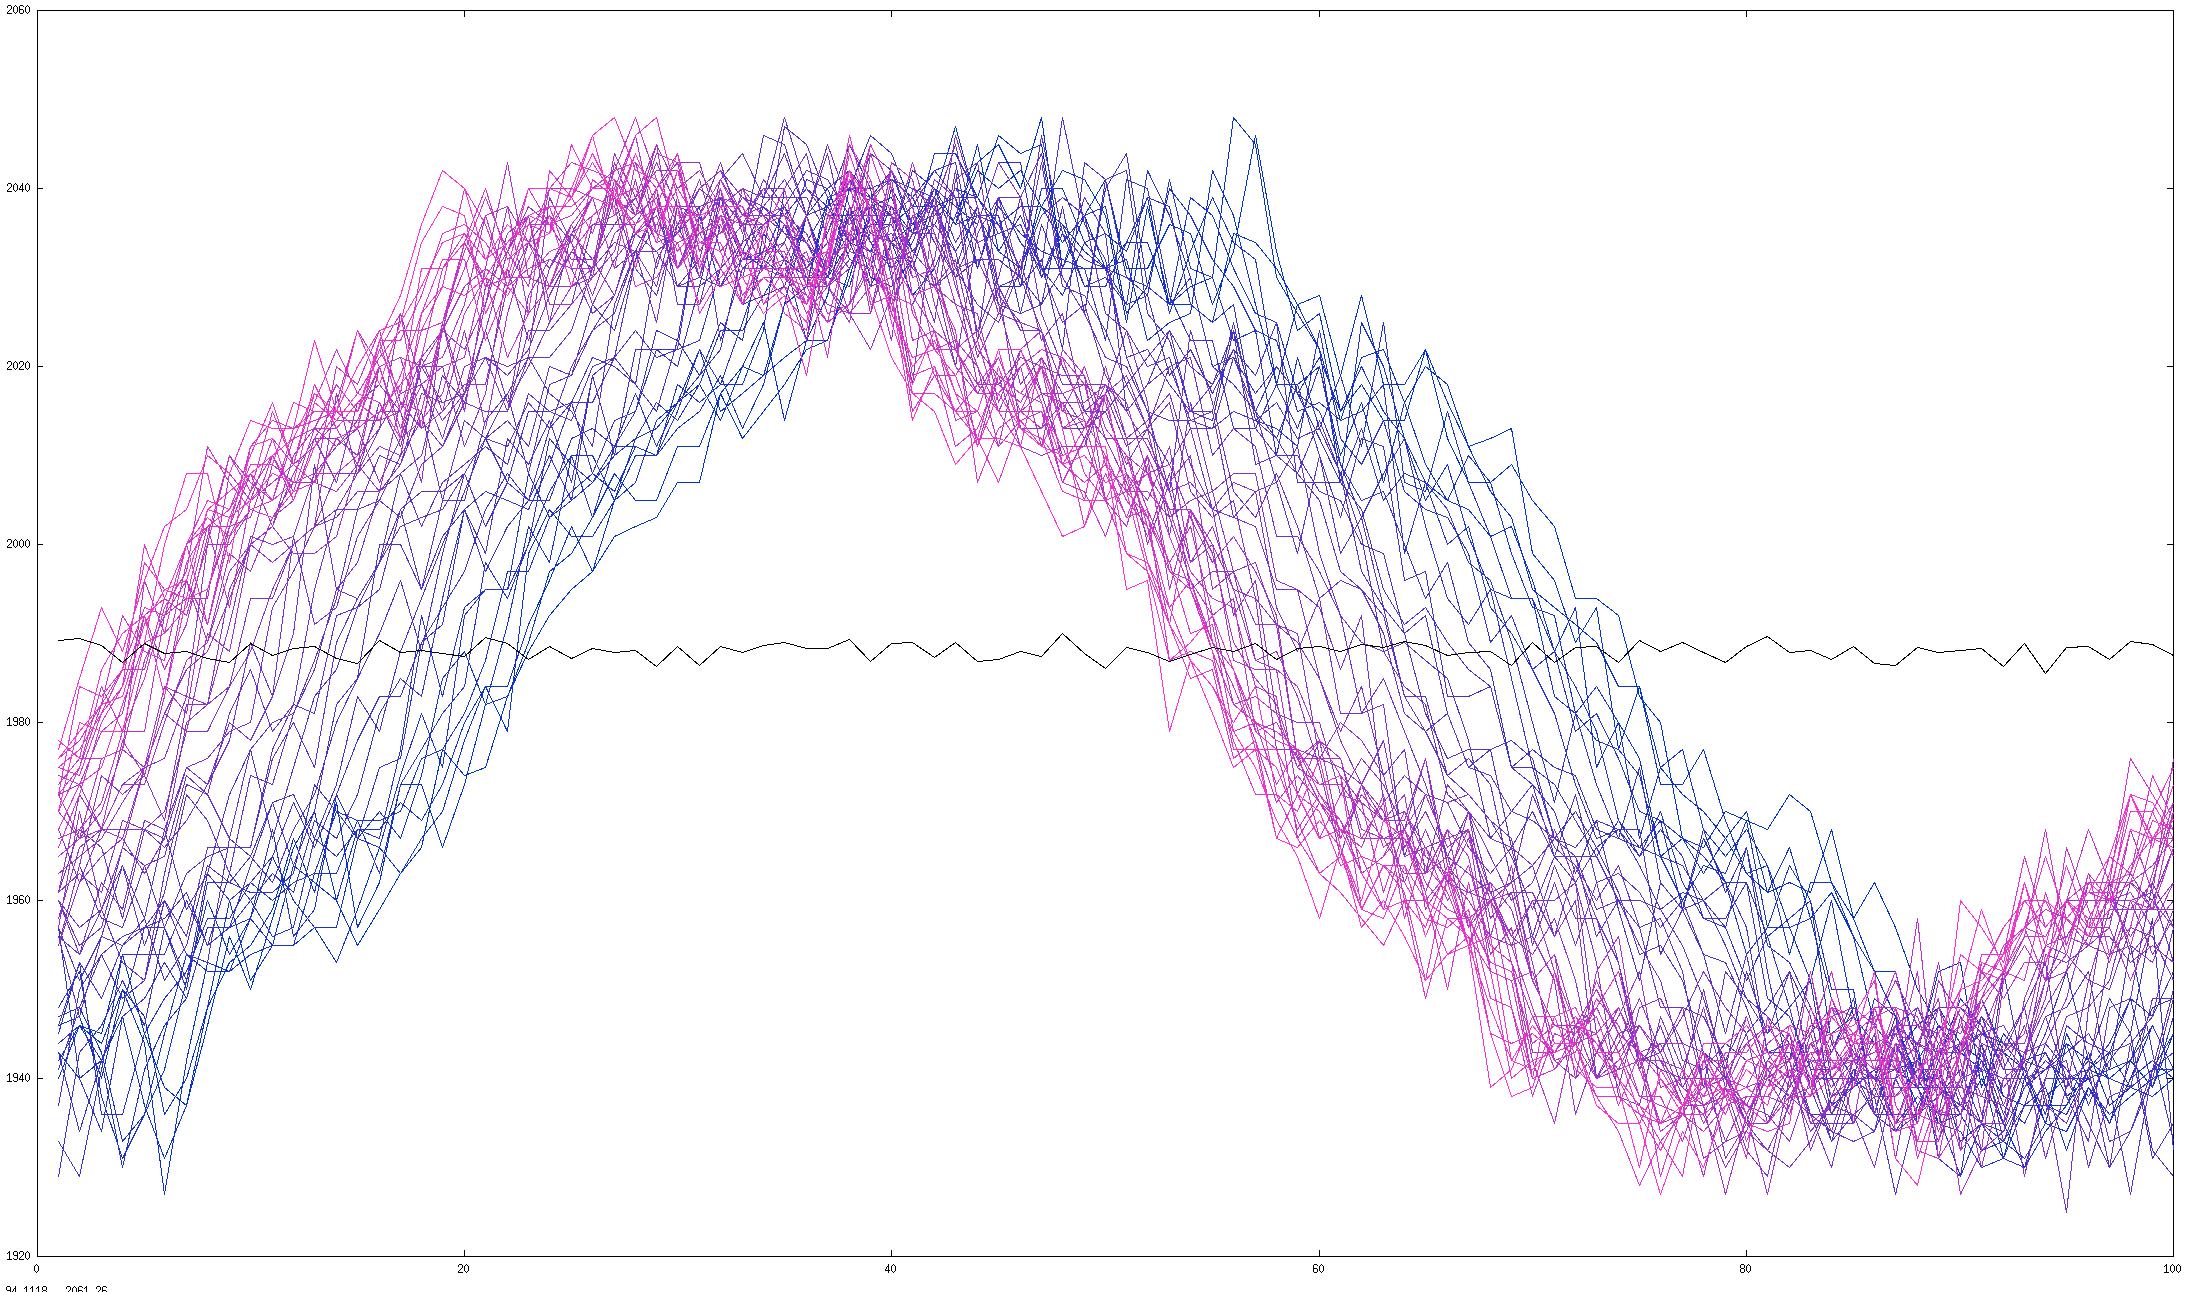 Current curve